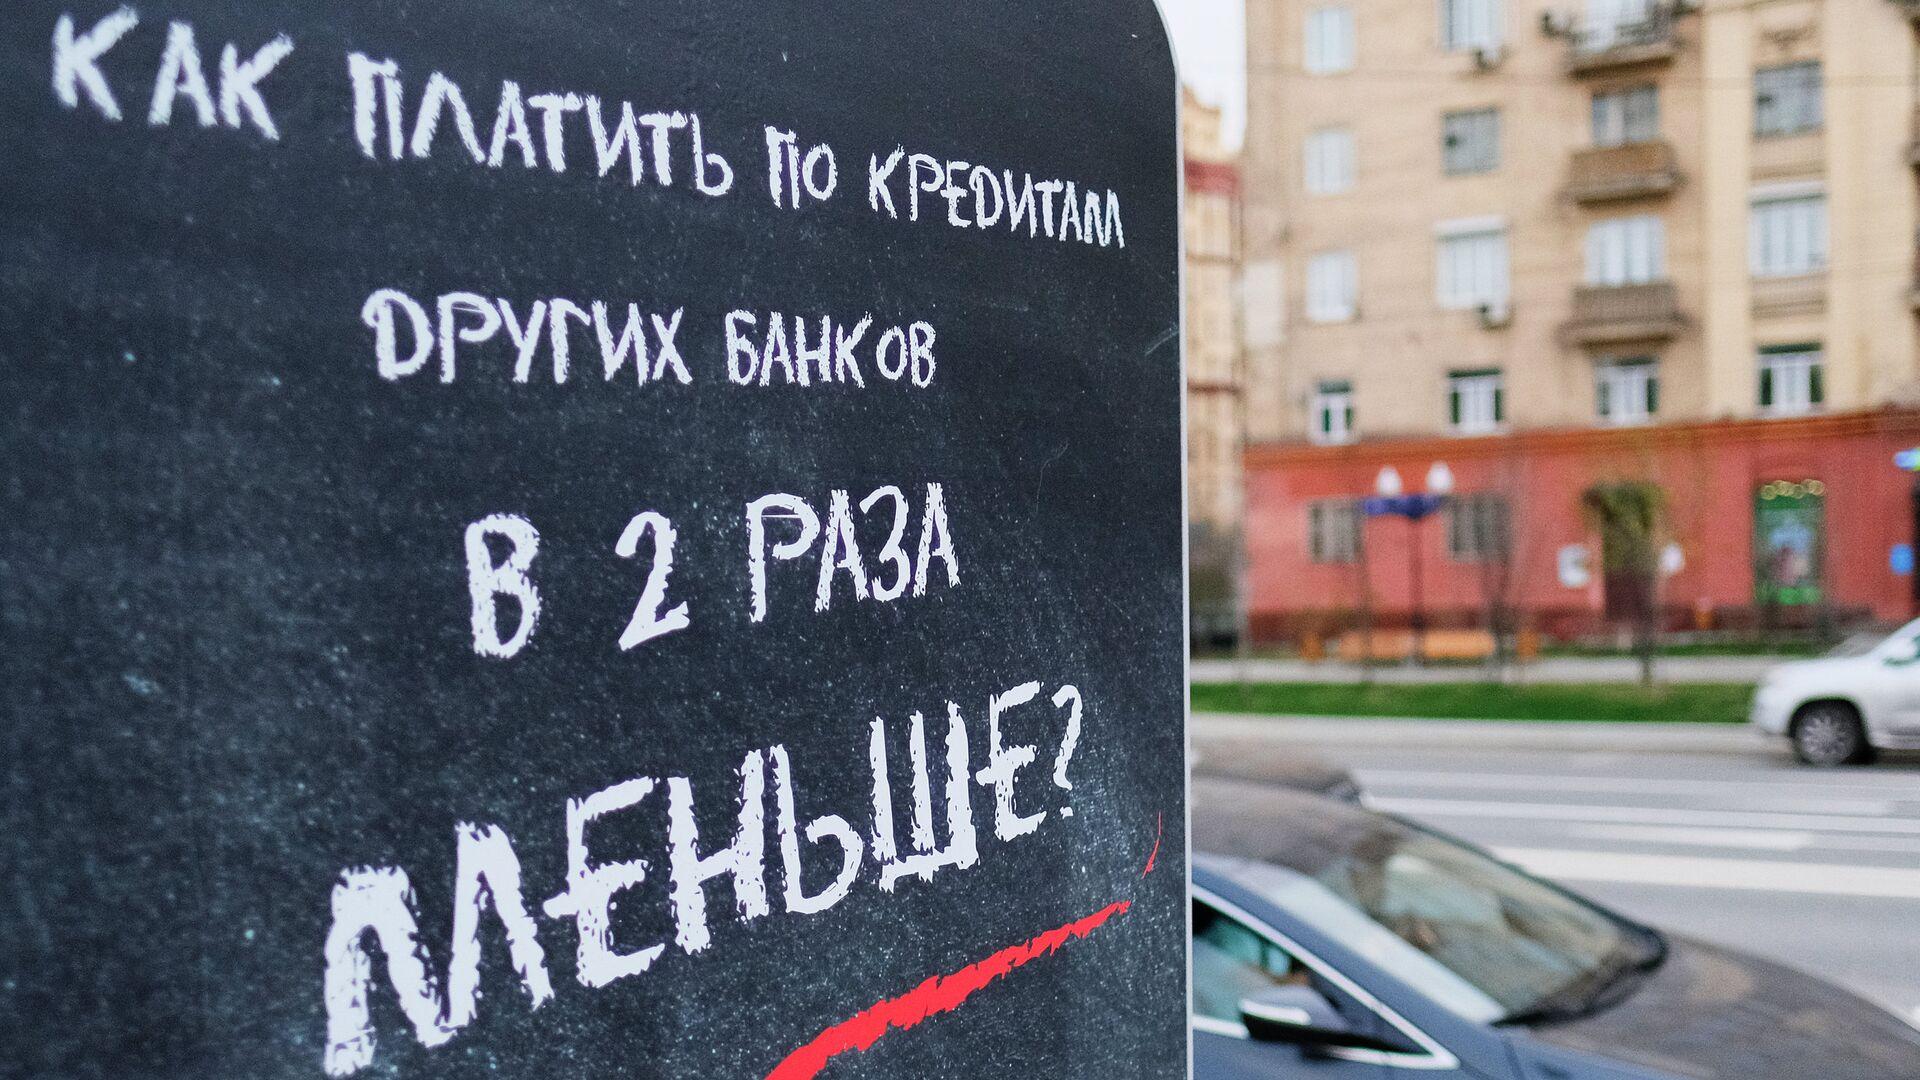 Реклама рефинансирования кредита - РИА Новости, 1920, 28.10.2020